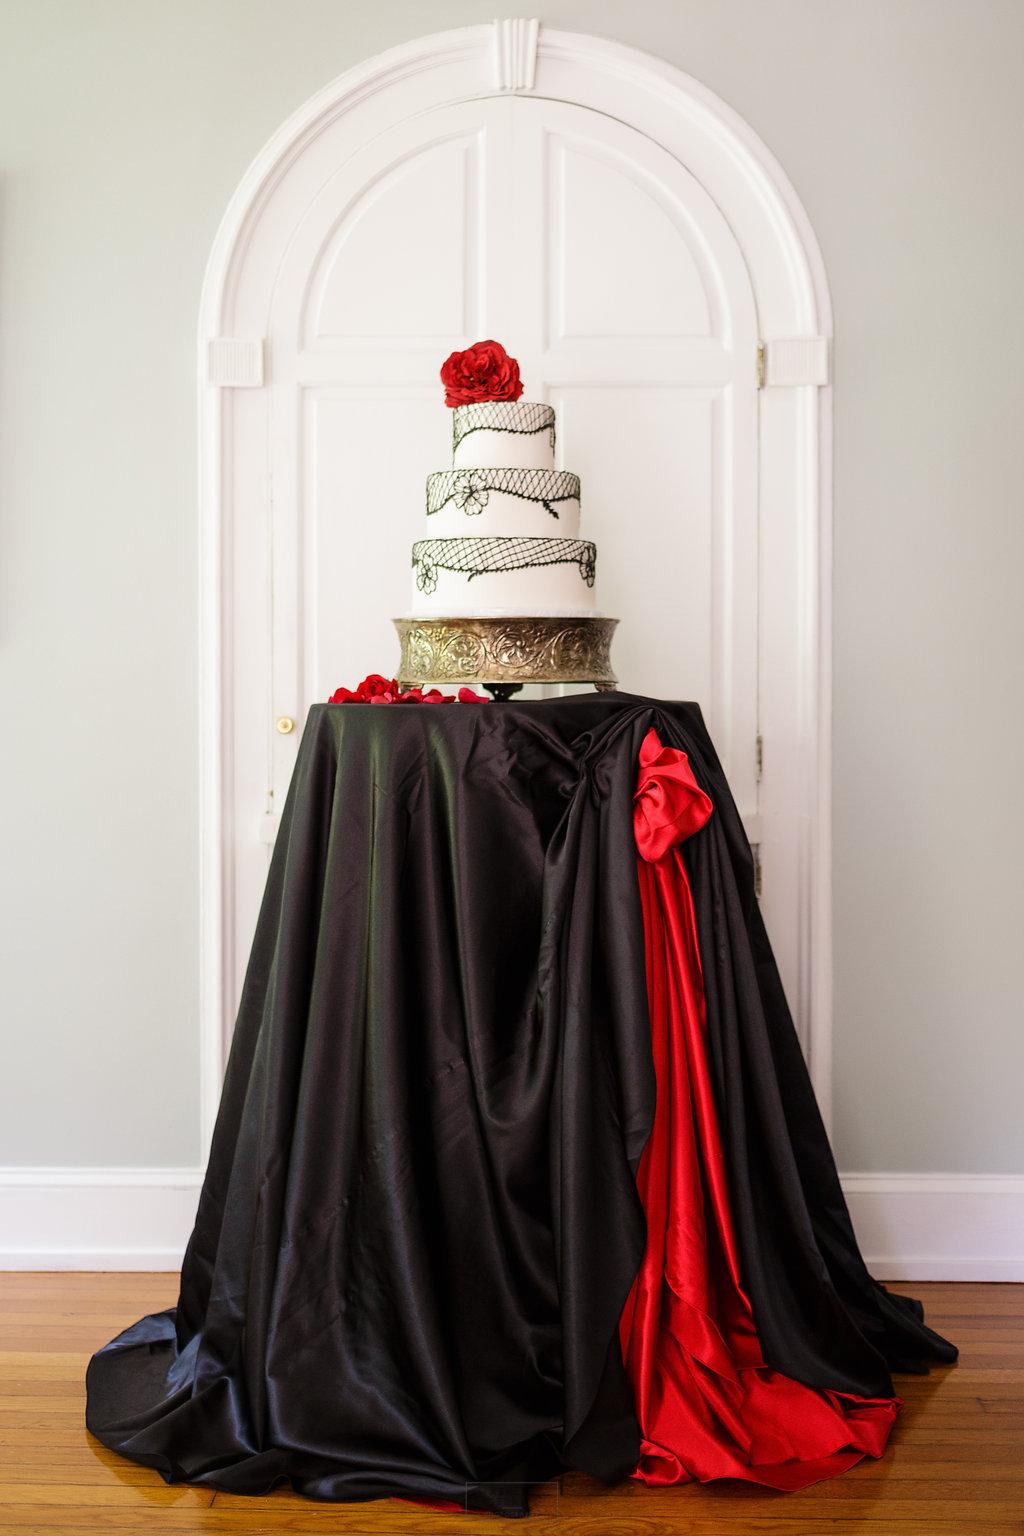 20 Flamenco Dancer Wedding Cake Inspiration Black Lace Red Rose Wedding.jpg